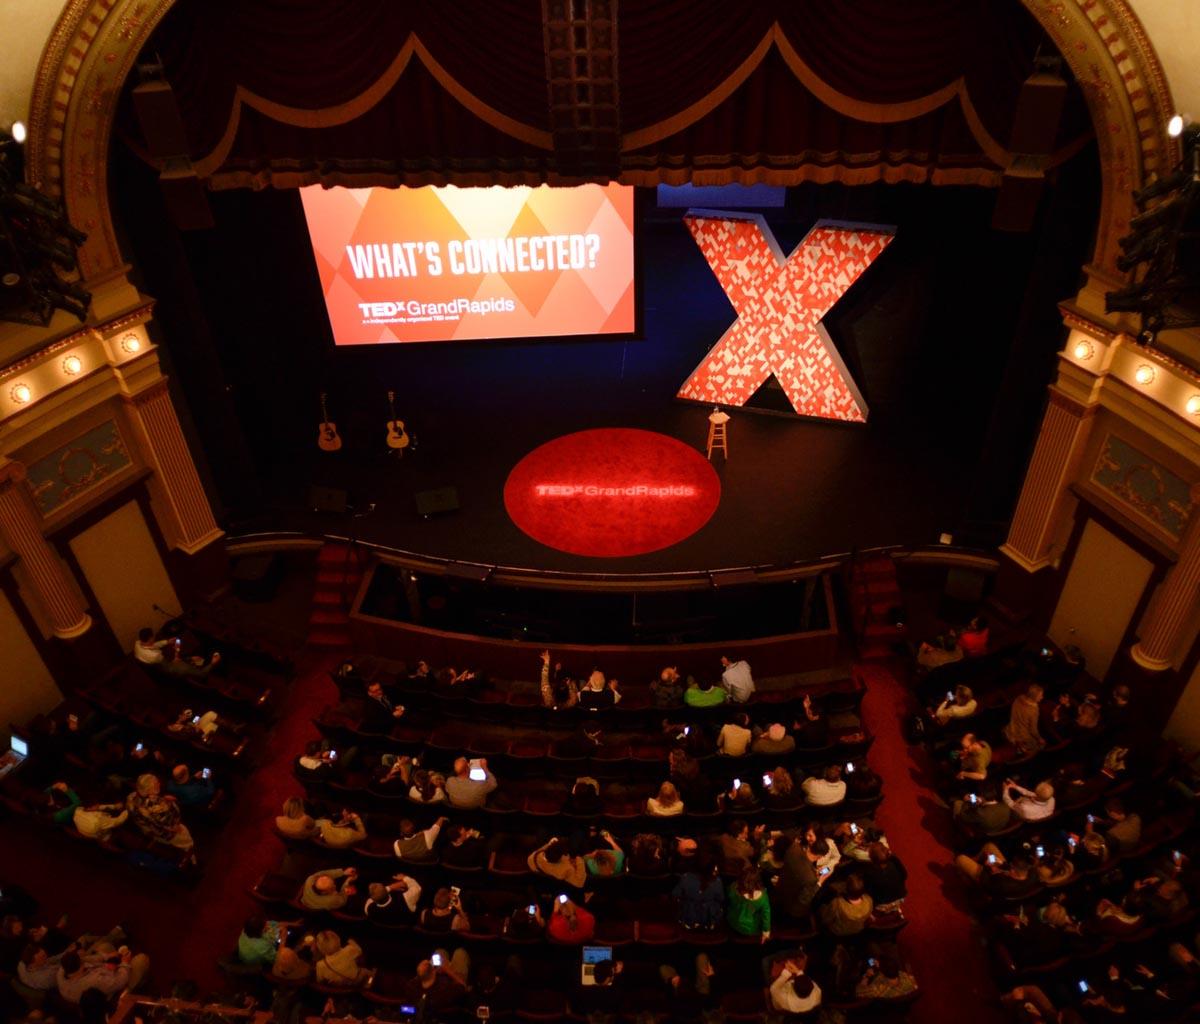 From the Peanut Gallery. TEDxGrandRapids 2014.